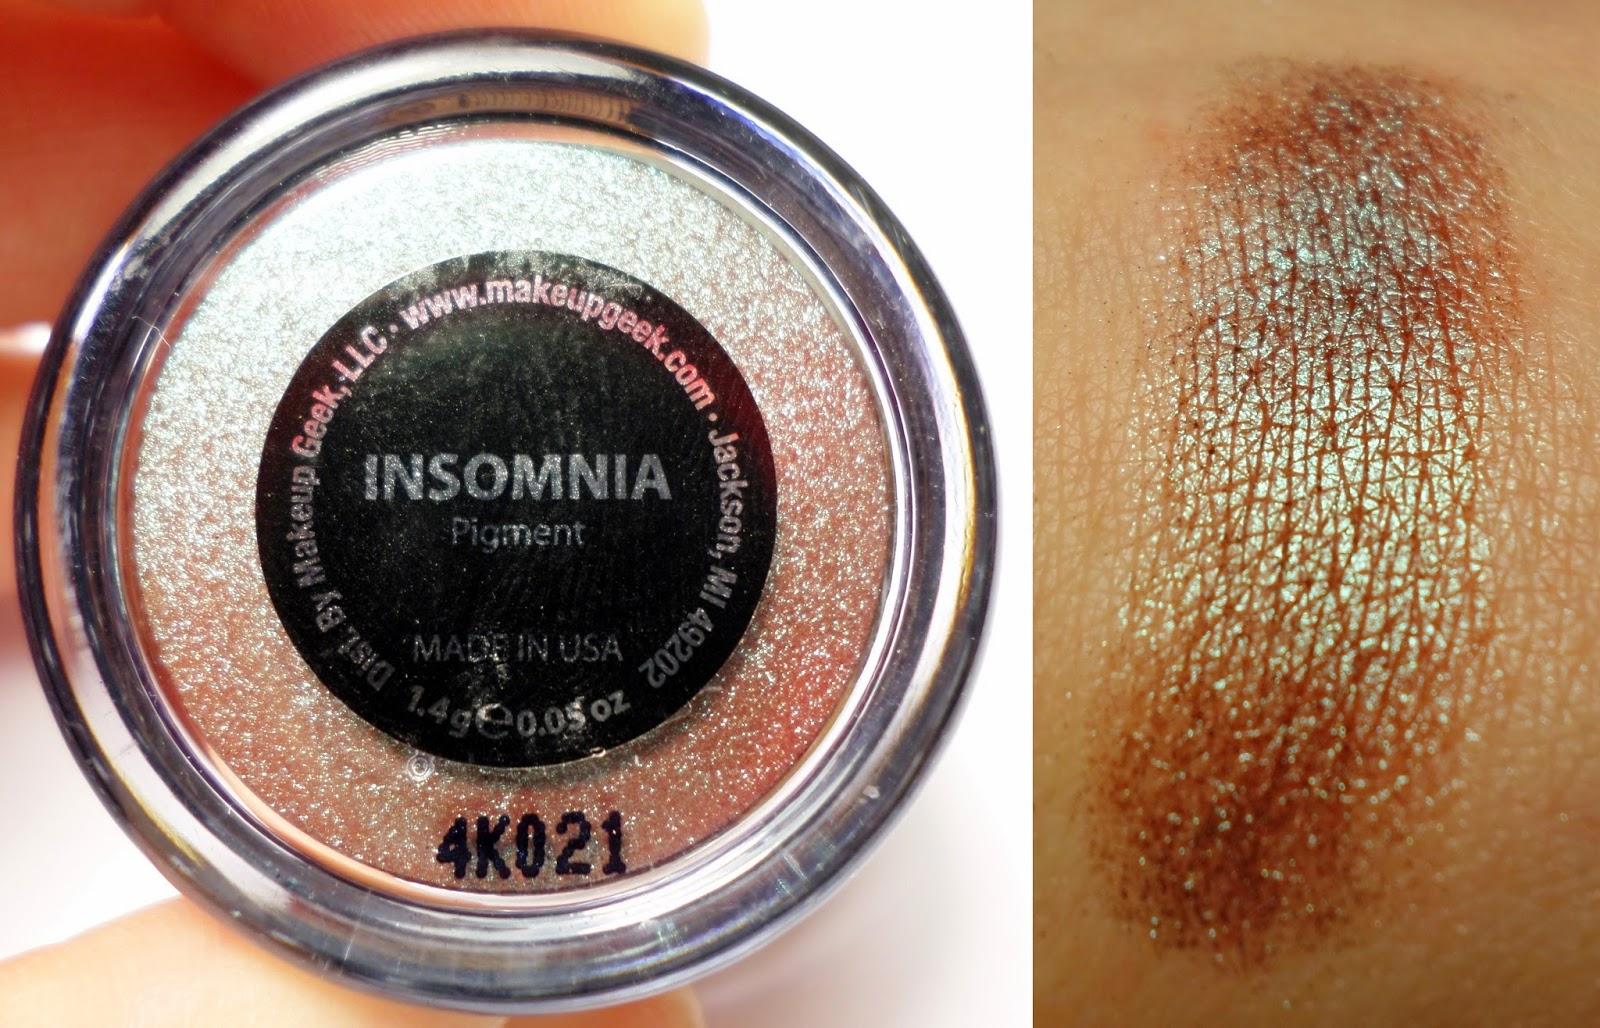 Makeup Geek Insomnia Loose Pigment 1.4g